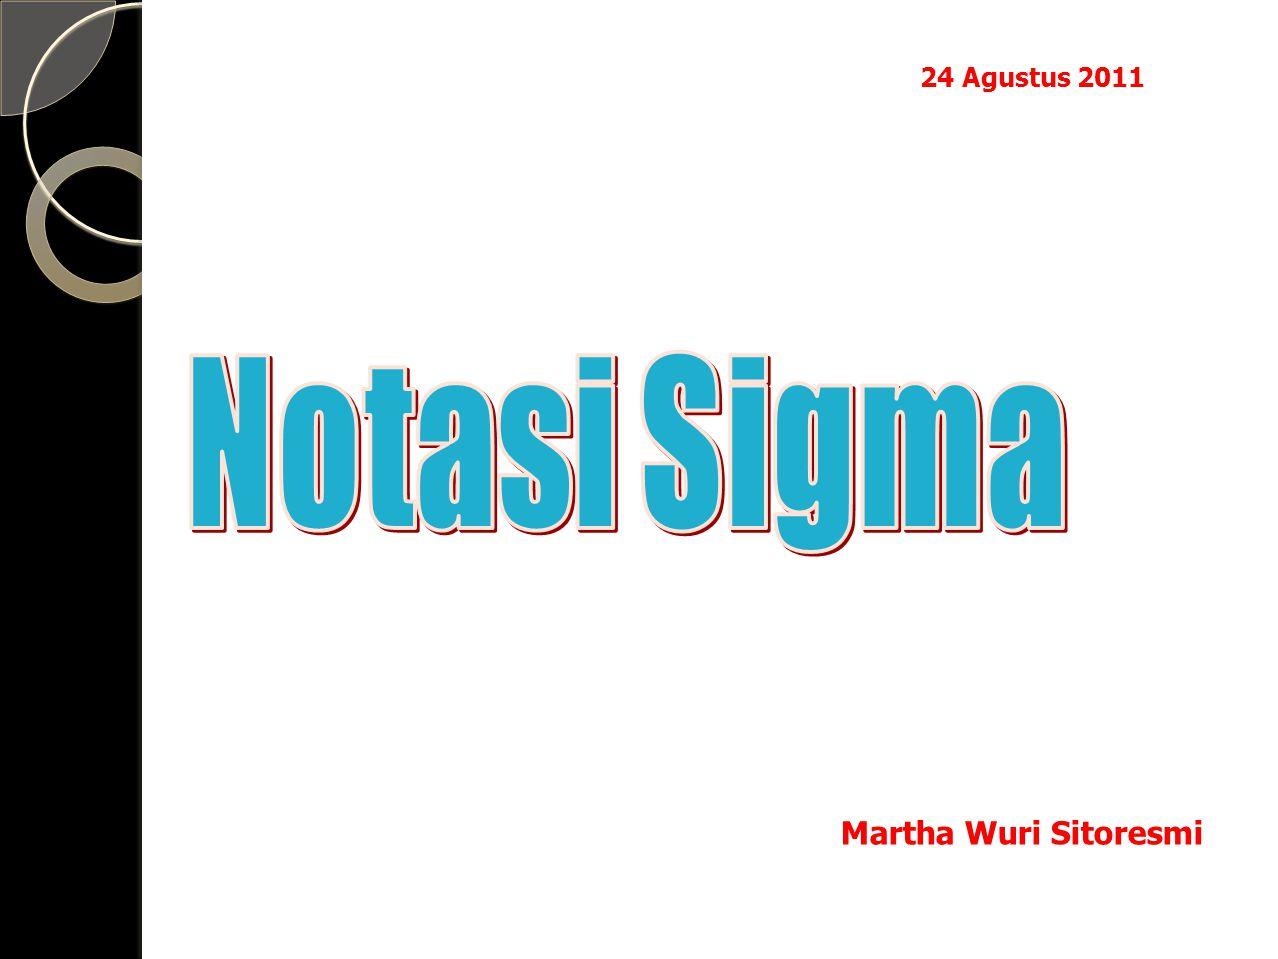 24 Agustus 2011 Martha Wuri Sitoresmi